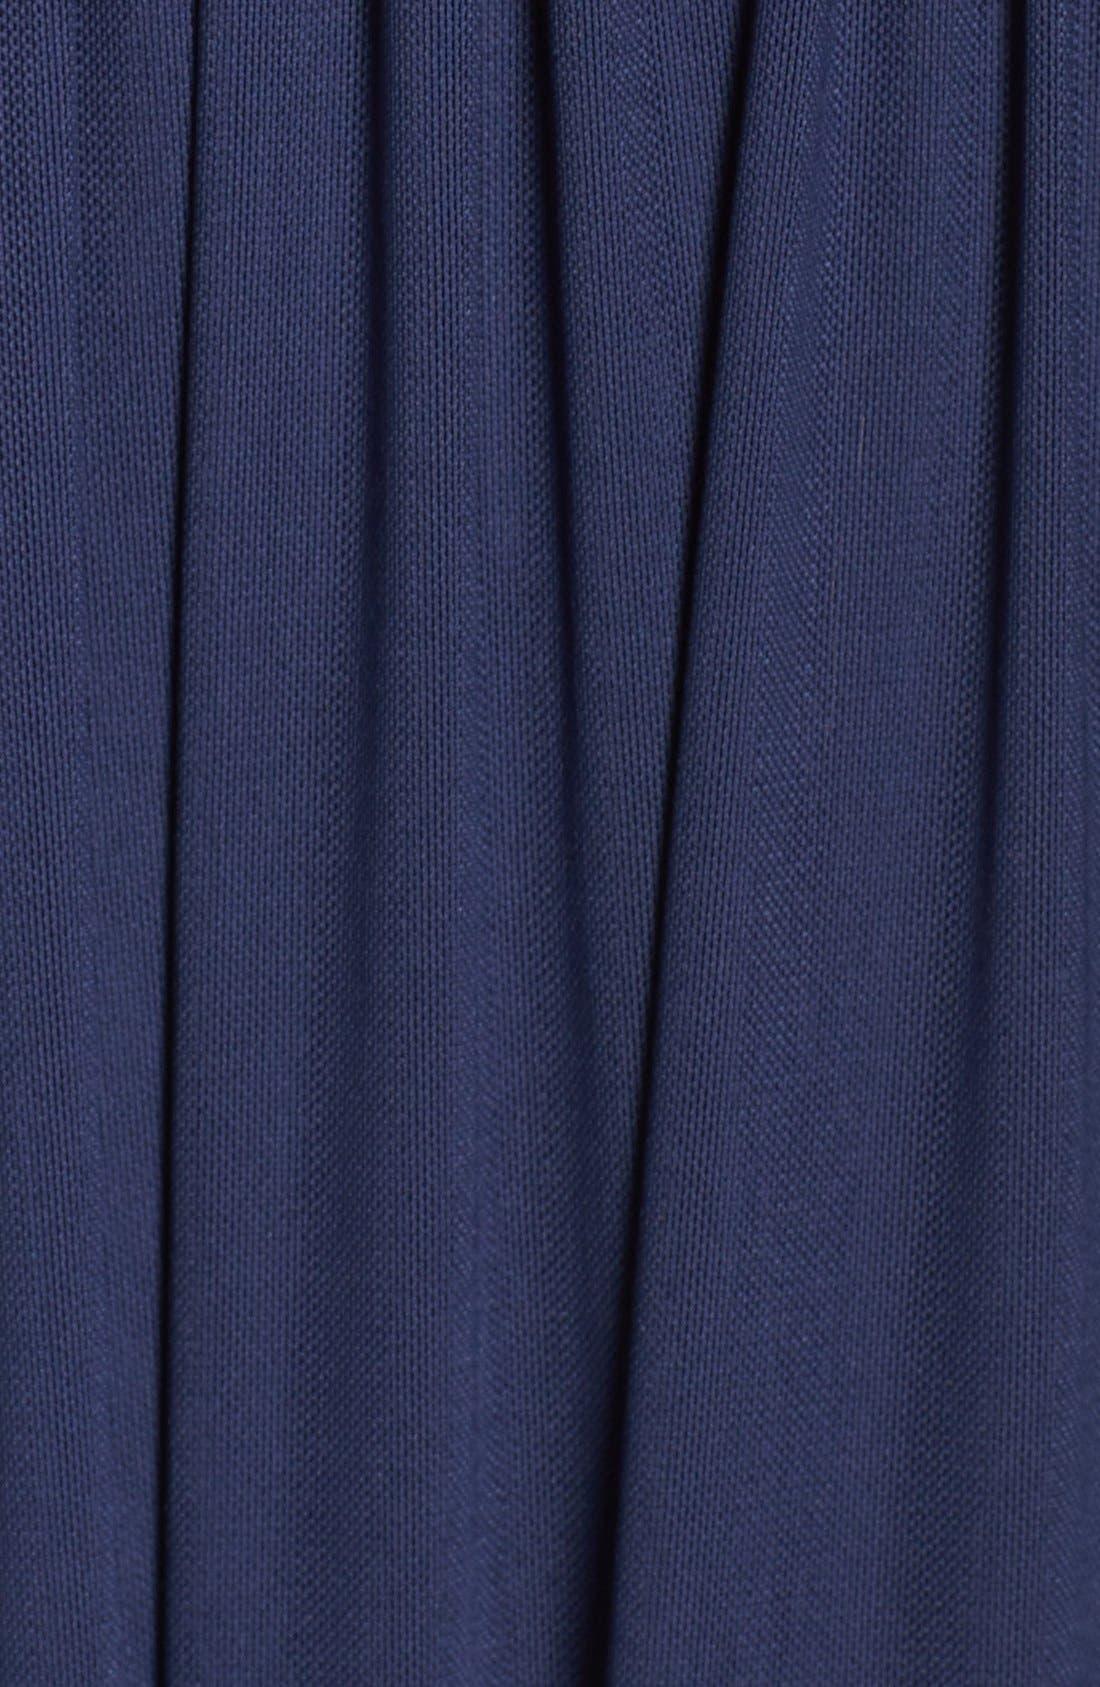 Illusion Neck A-Line Gown,                             Alternate thumbnail 25, color,